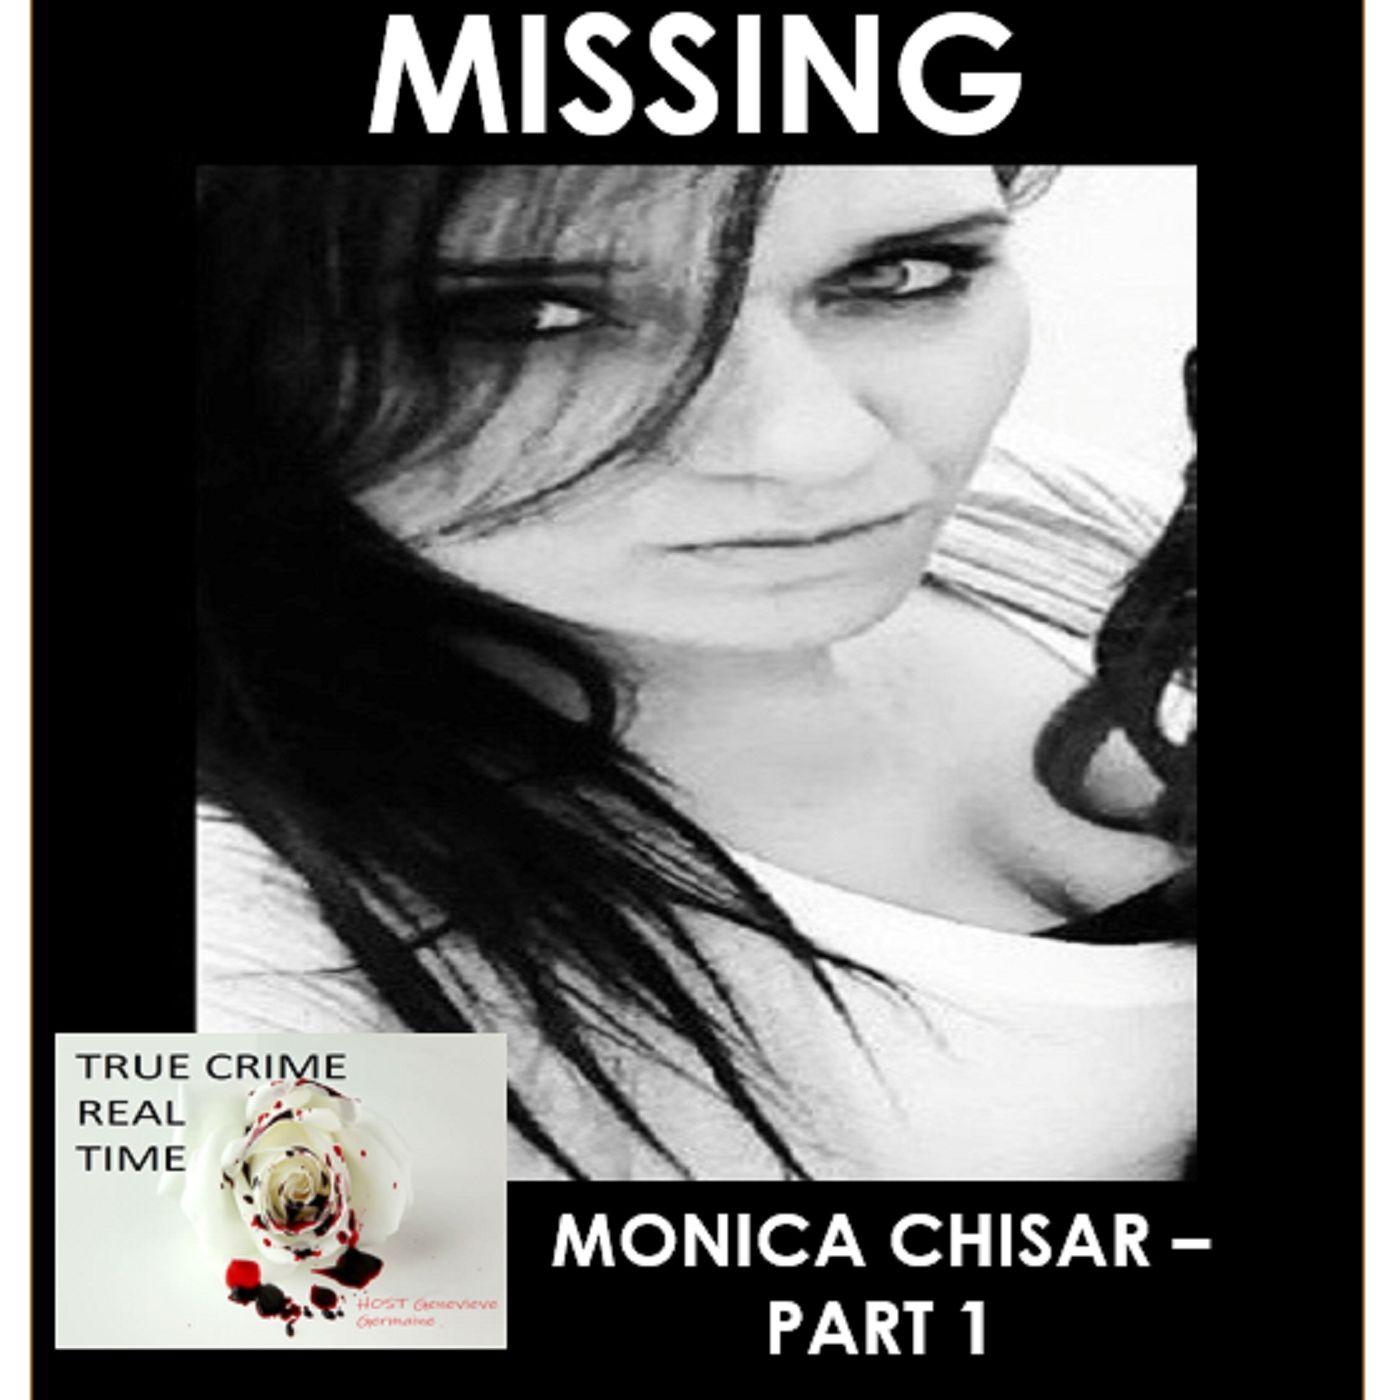 #14 - Bohemian - Monica Chisar - Part 1